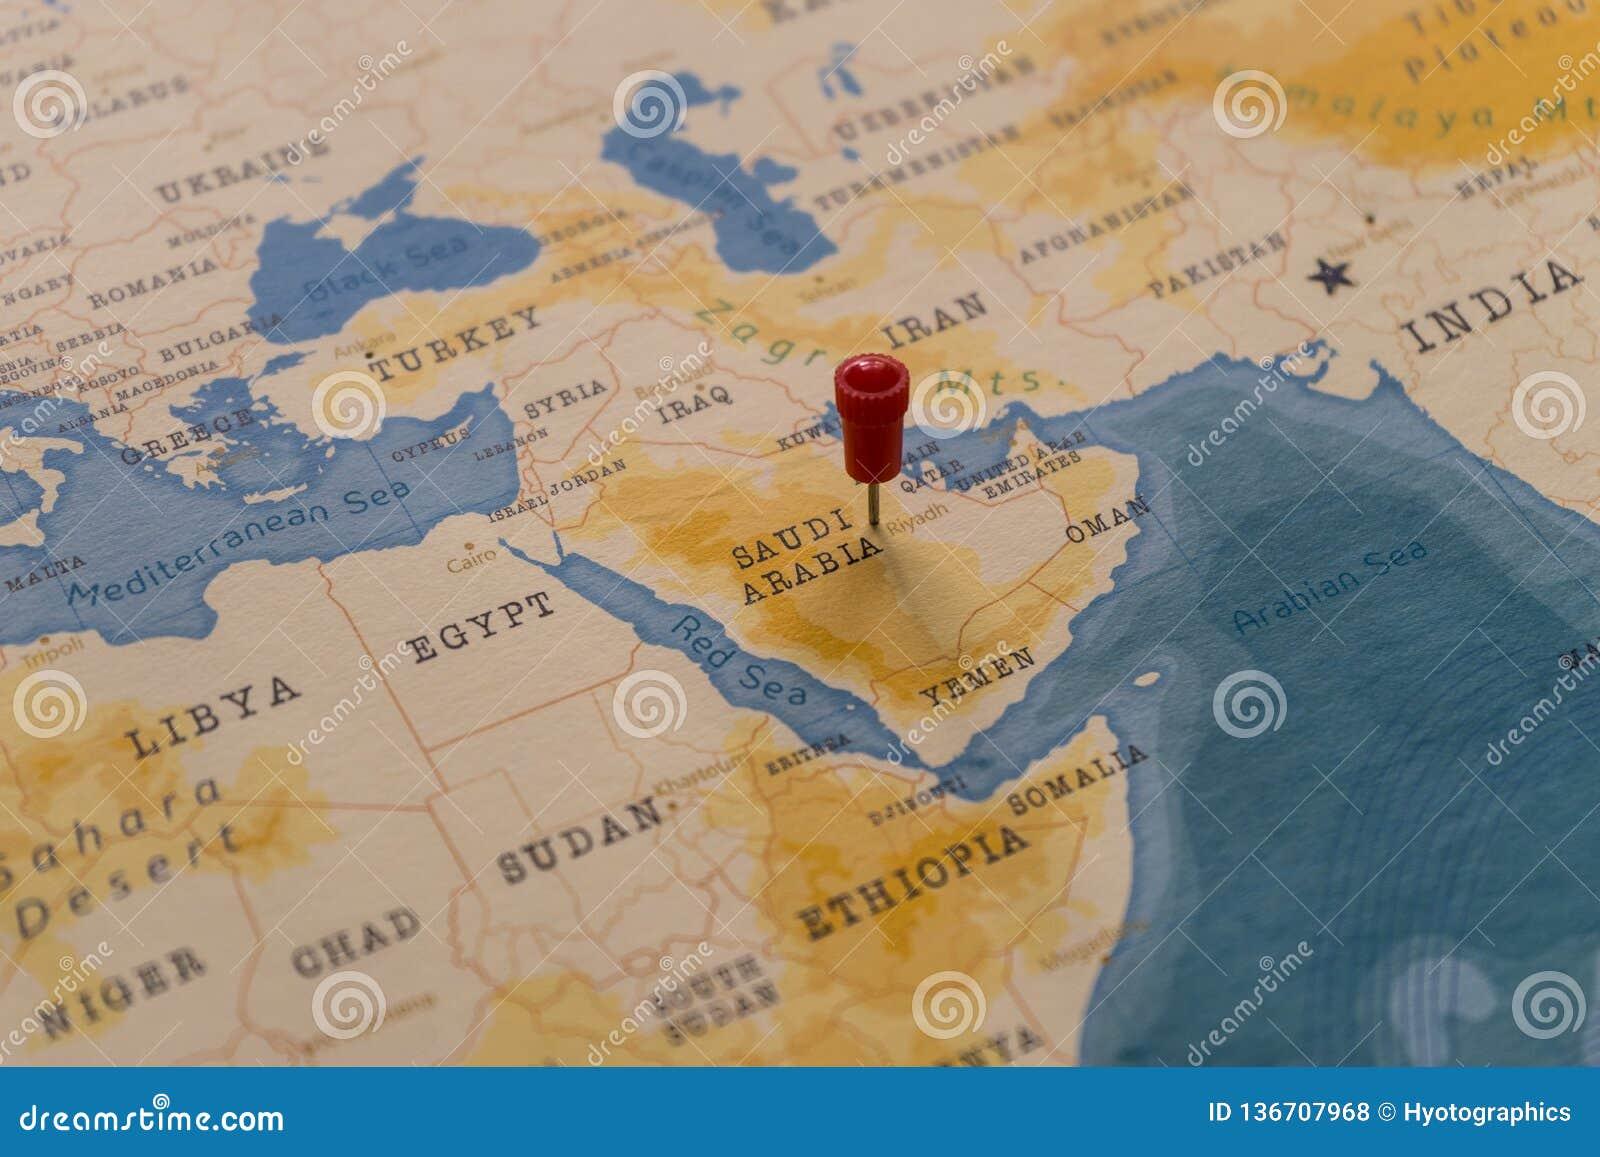 A Pin On Riyadh, Saudi Arabia In The World Map Stock Photo ...